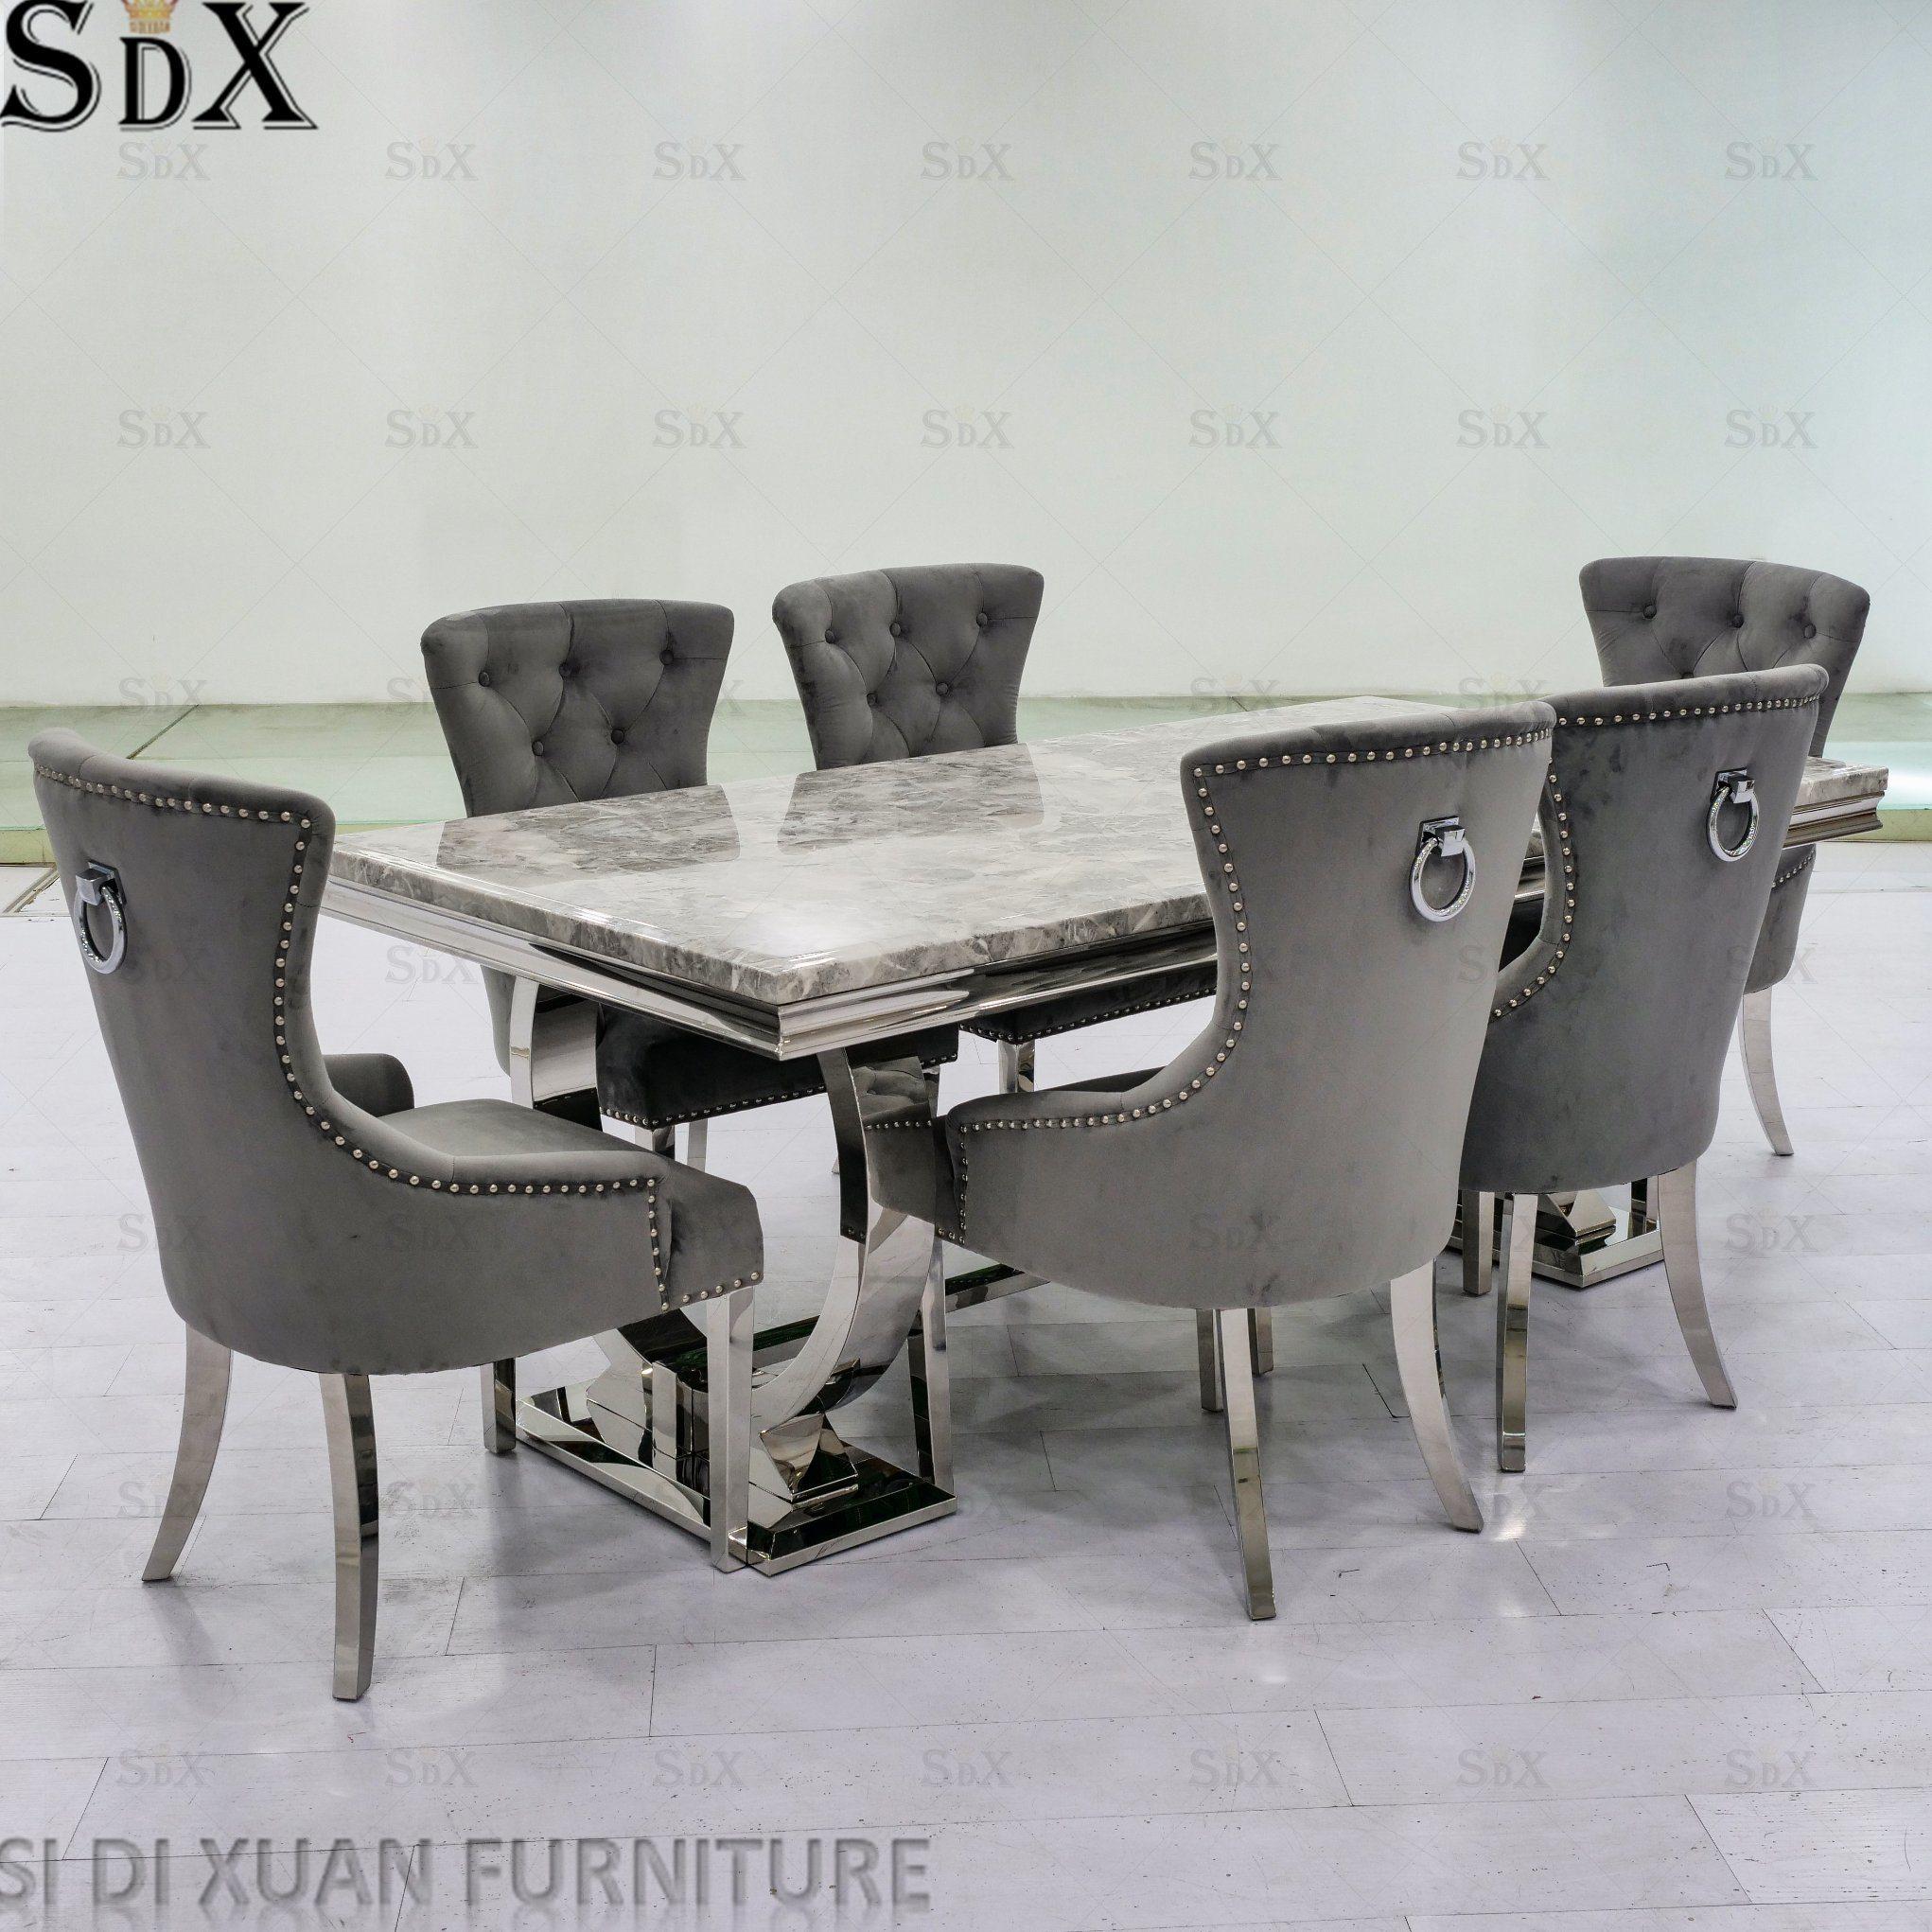 China Modern Popular Ariana Design Home Dining Room Furniture Dining Table Set China Dining Table Set Furniture Set